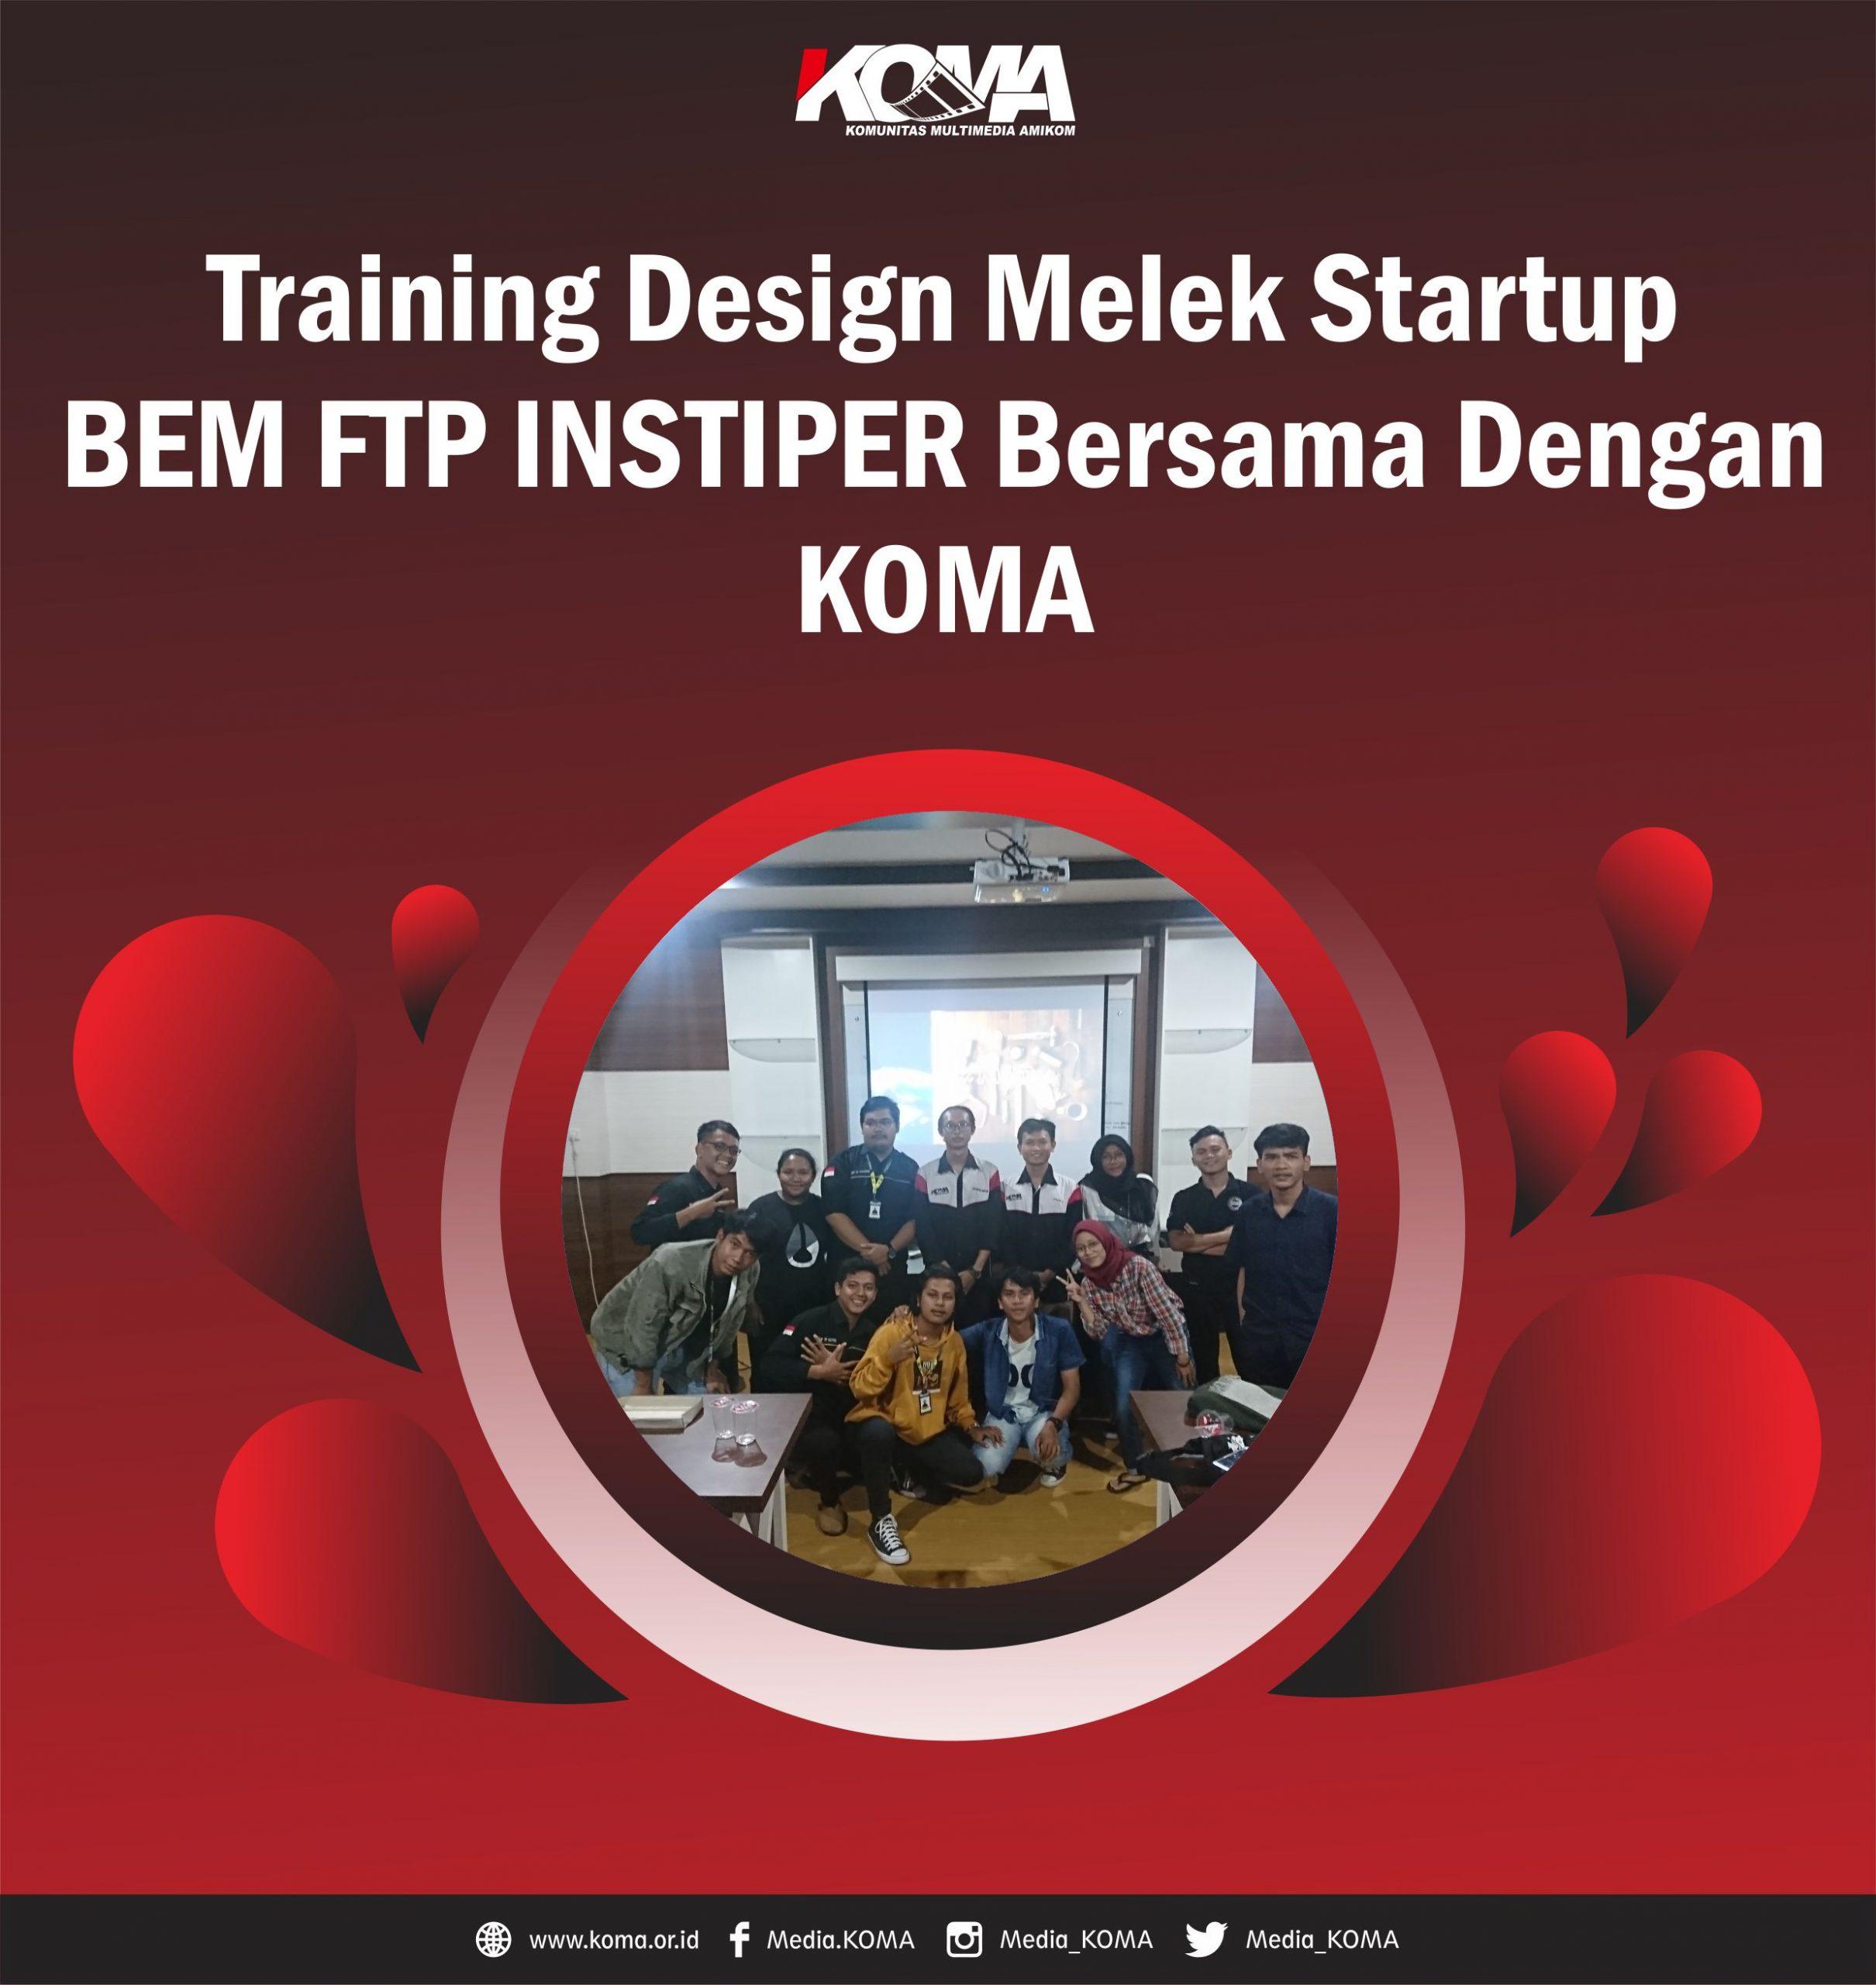 Training-Design-Melek-Startup-BEM-FTP-INSTIPER-Bersama-Dengan-KOMA